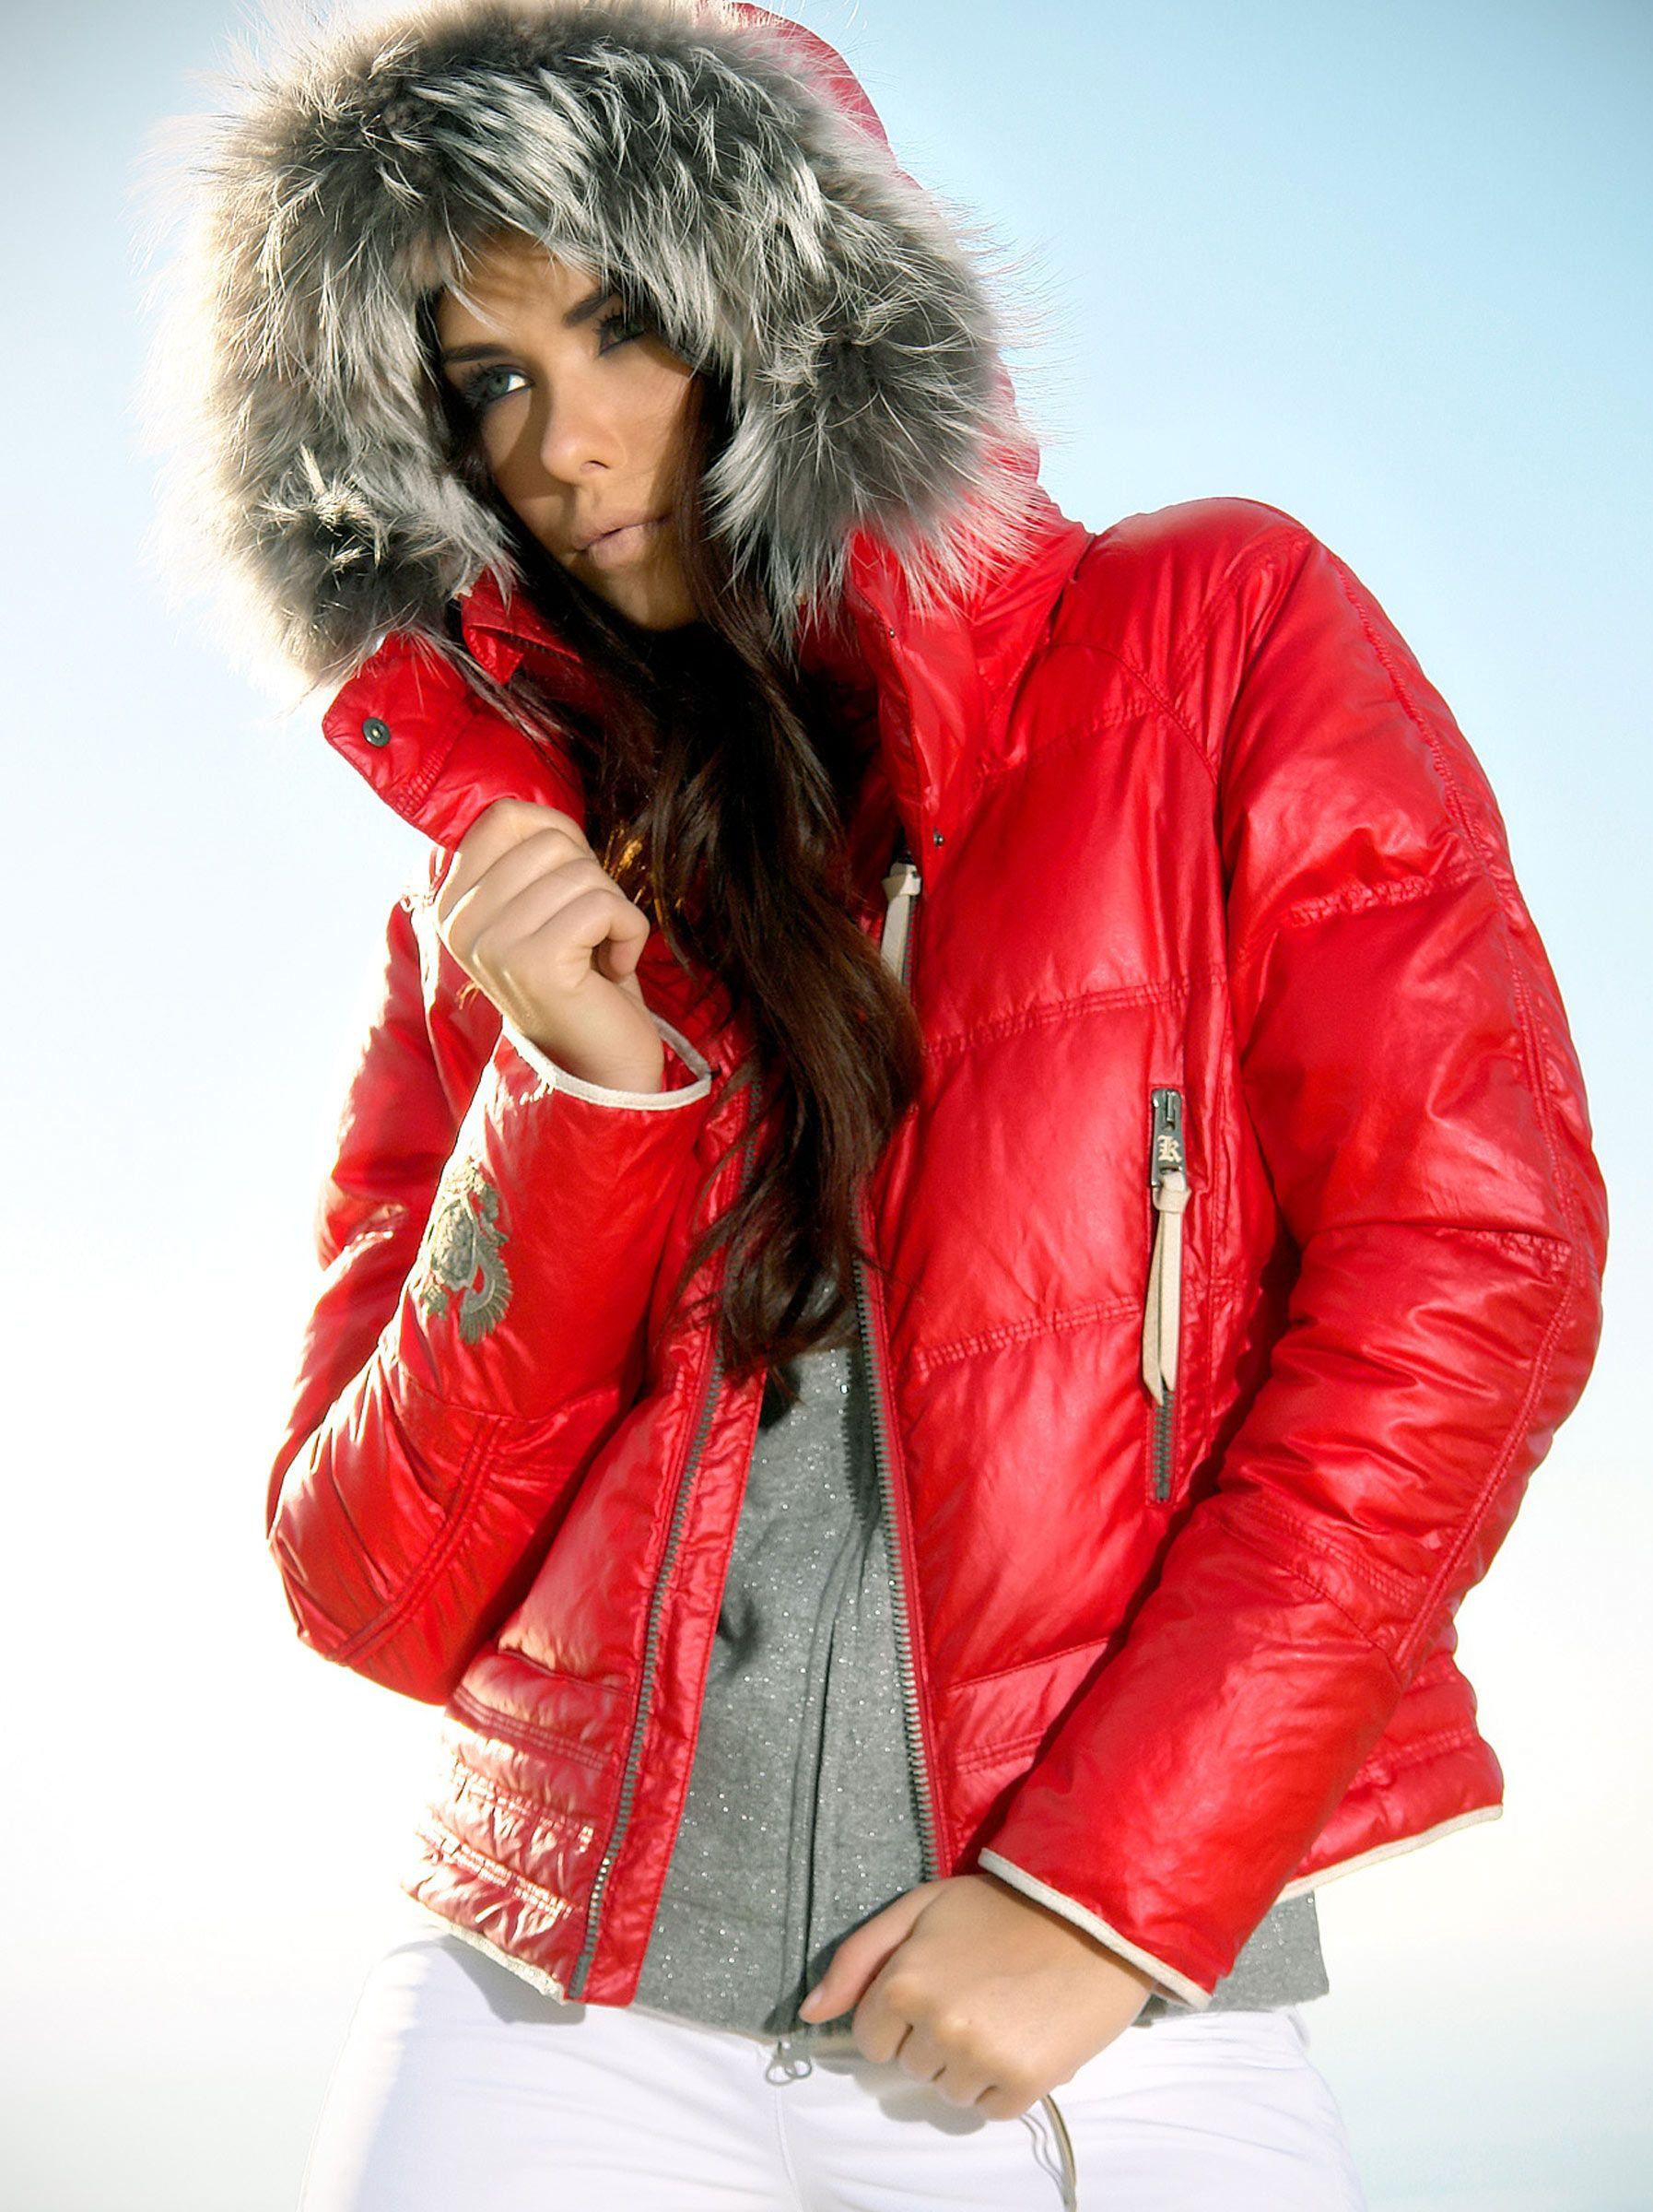 Women's ski Red Stunning Ski fashion Down Jacket Kelly Julia 5xPn0zqgR